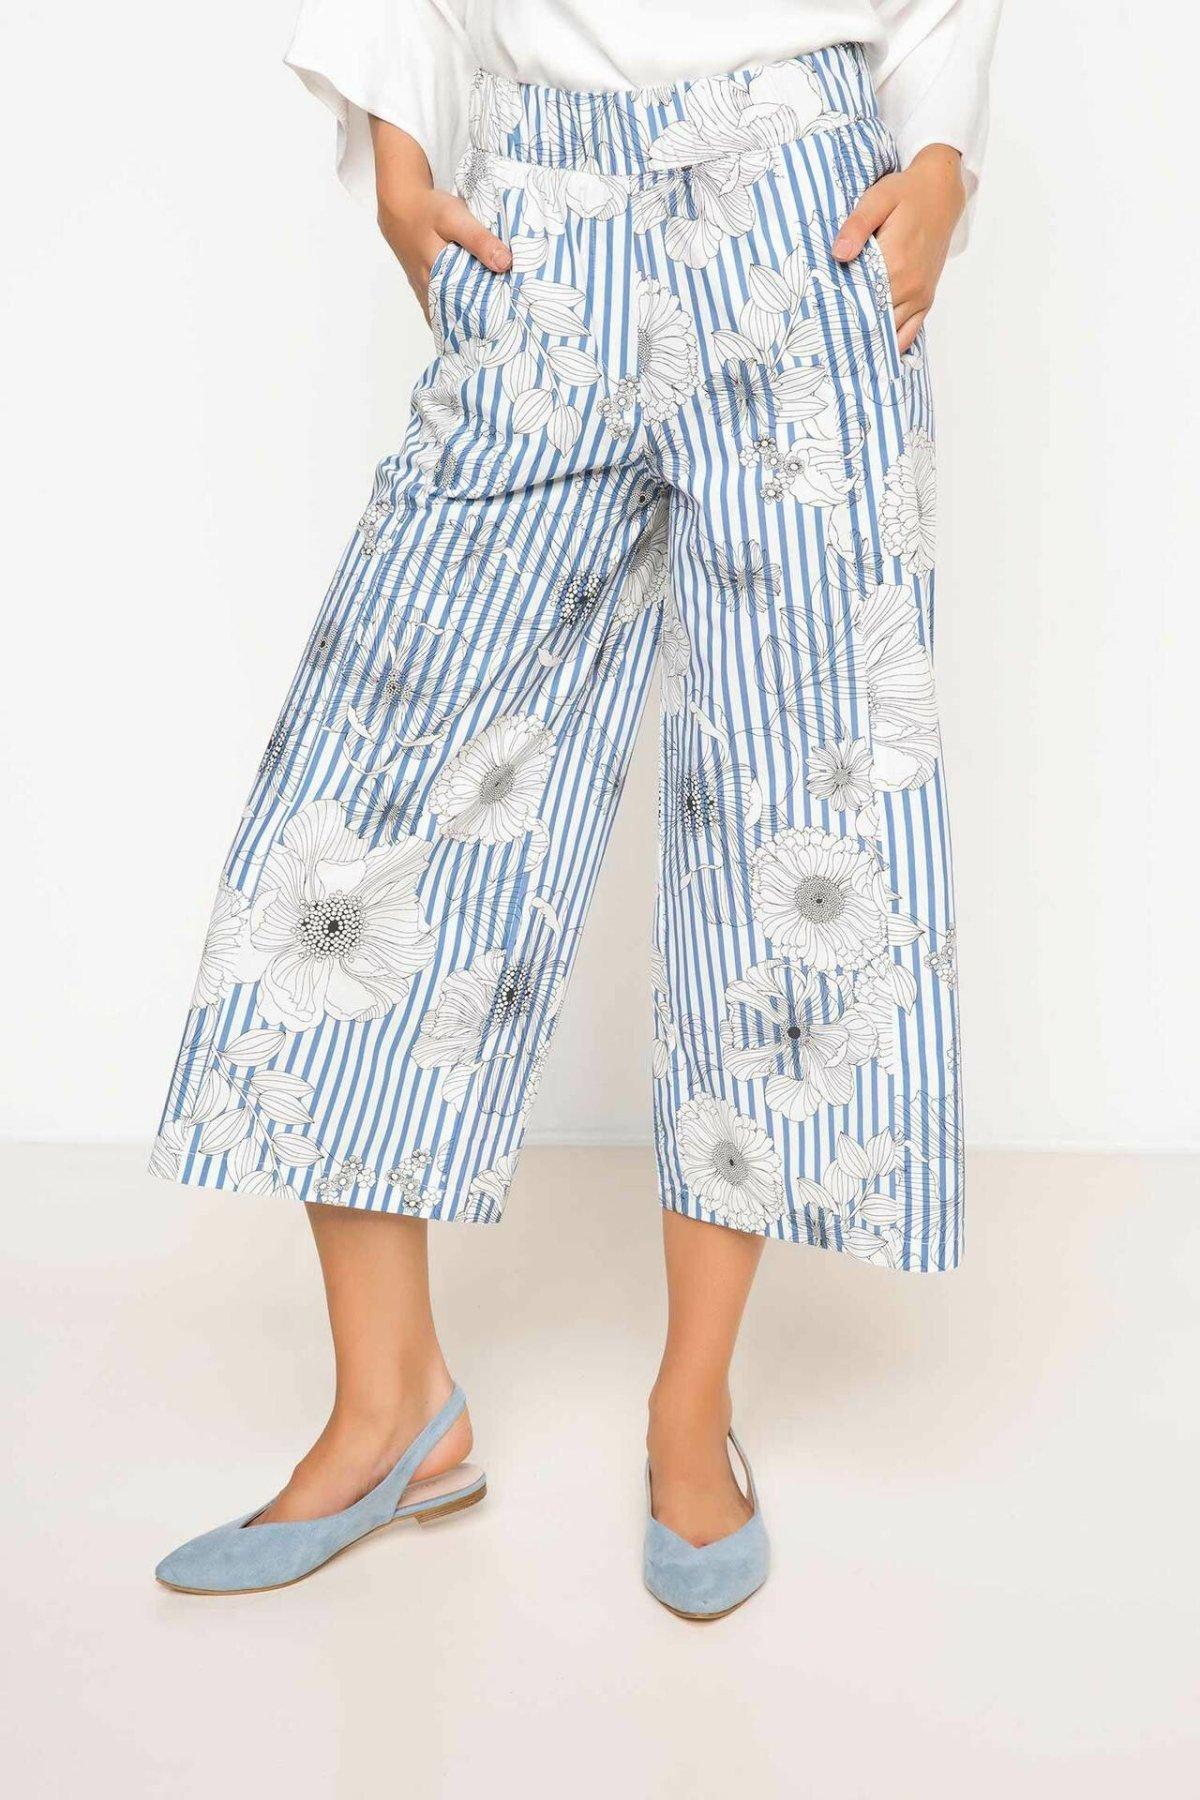 DeFacto Loose Striped Flowers Trousers Female Casual Comfort Crop Pants High Qualilty Loose Wide Leg Pant Ladies -I1706AZ17AU